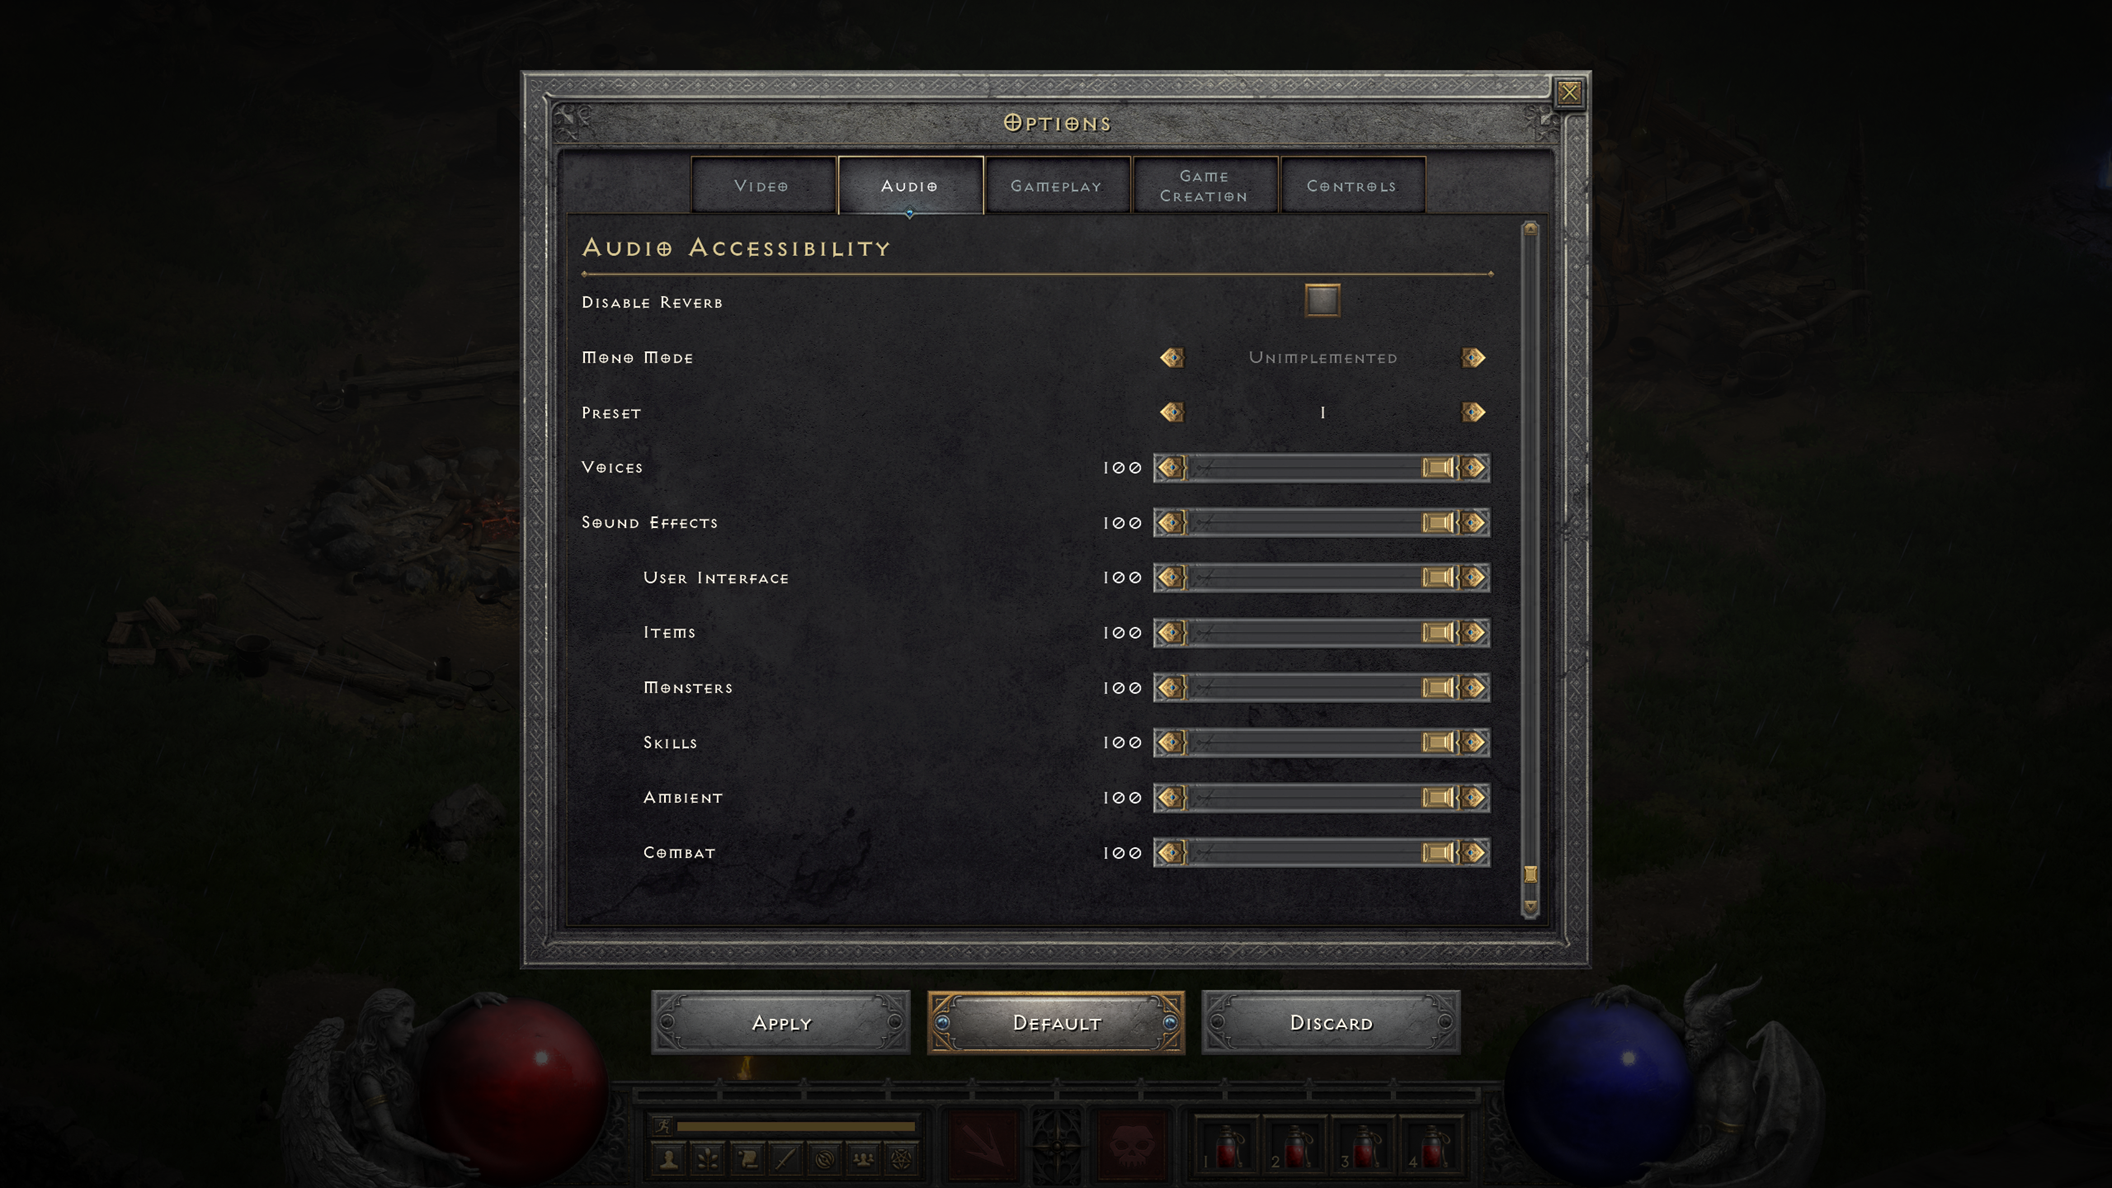 Blizzard on Diablo 2 Resurrected Accessibility